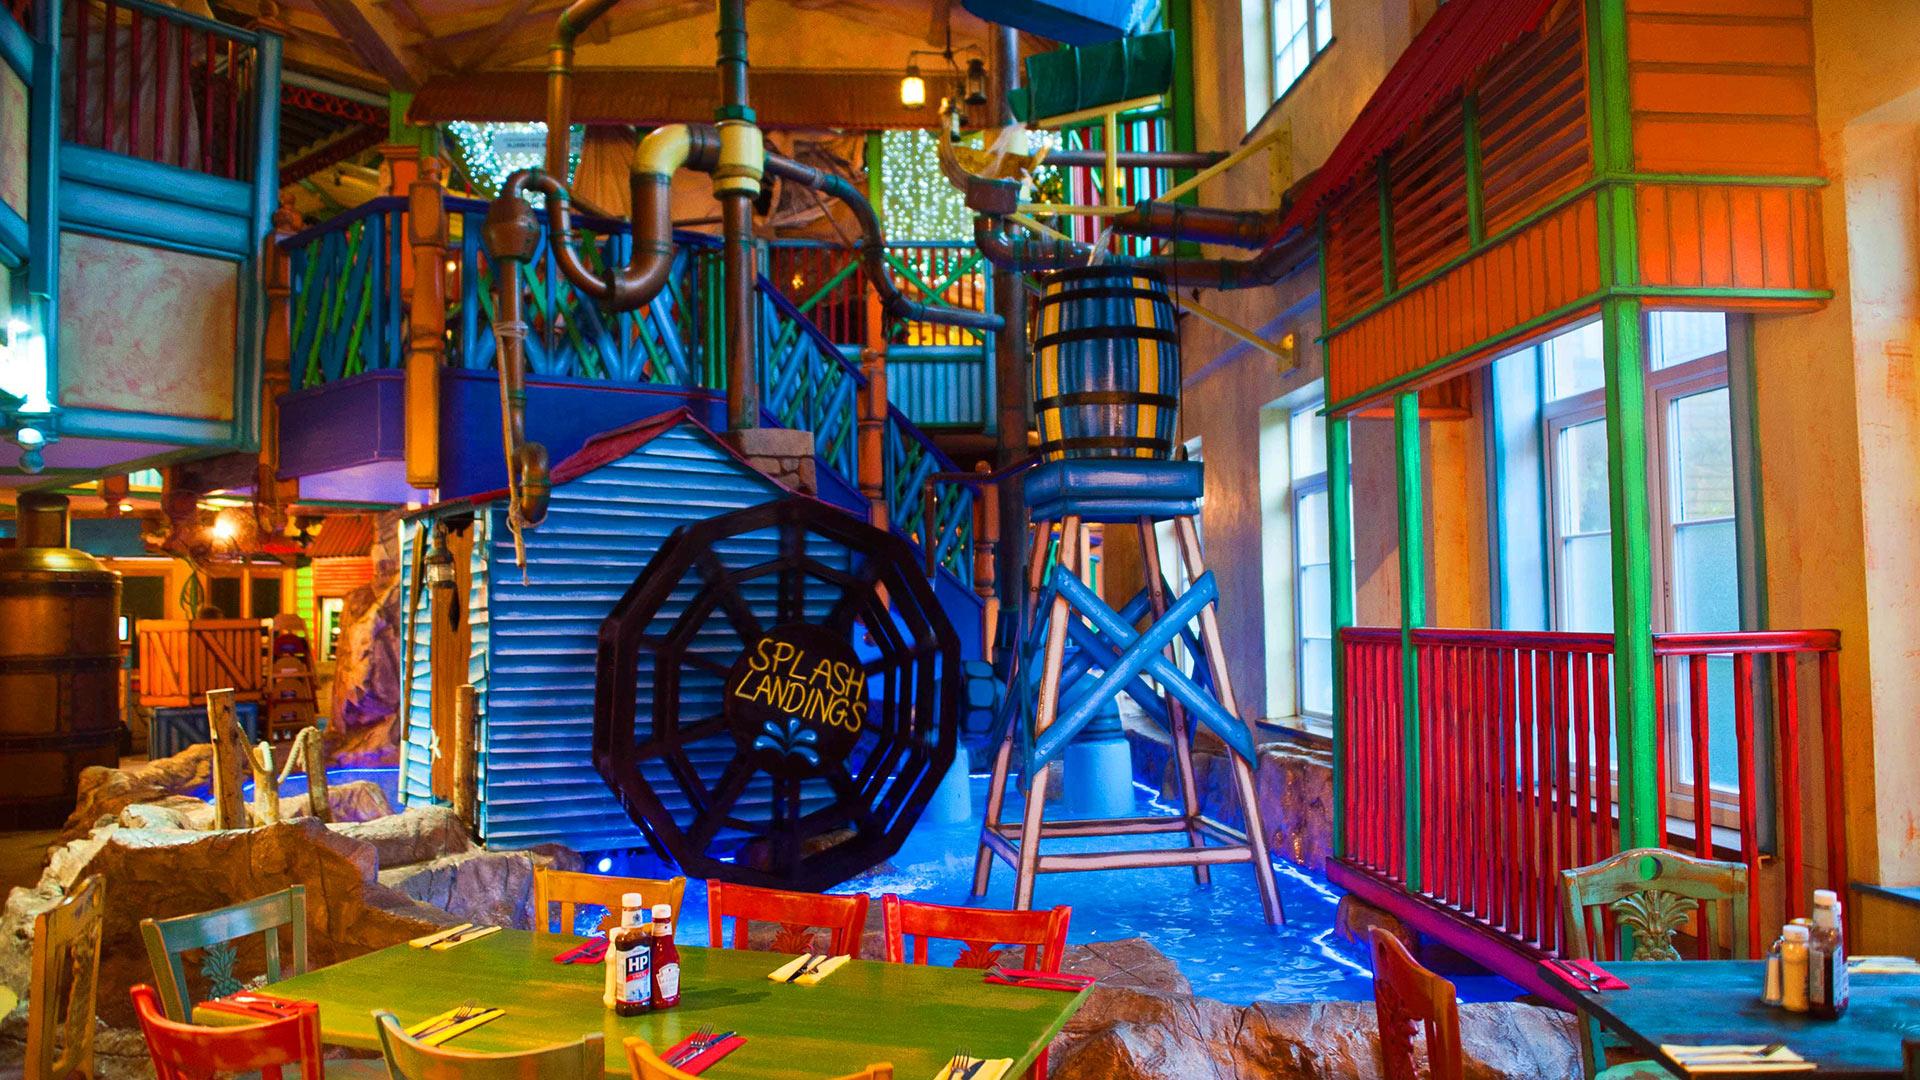 Splash Landings Uk Themed Hotel Alton Towers Resort